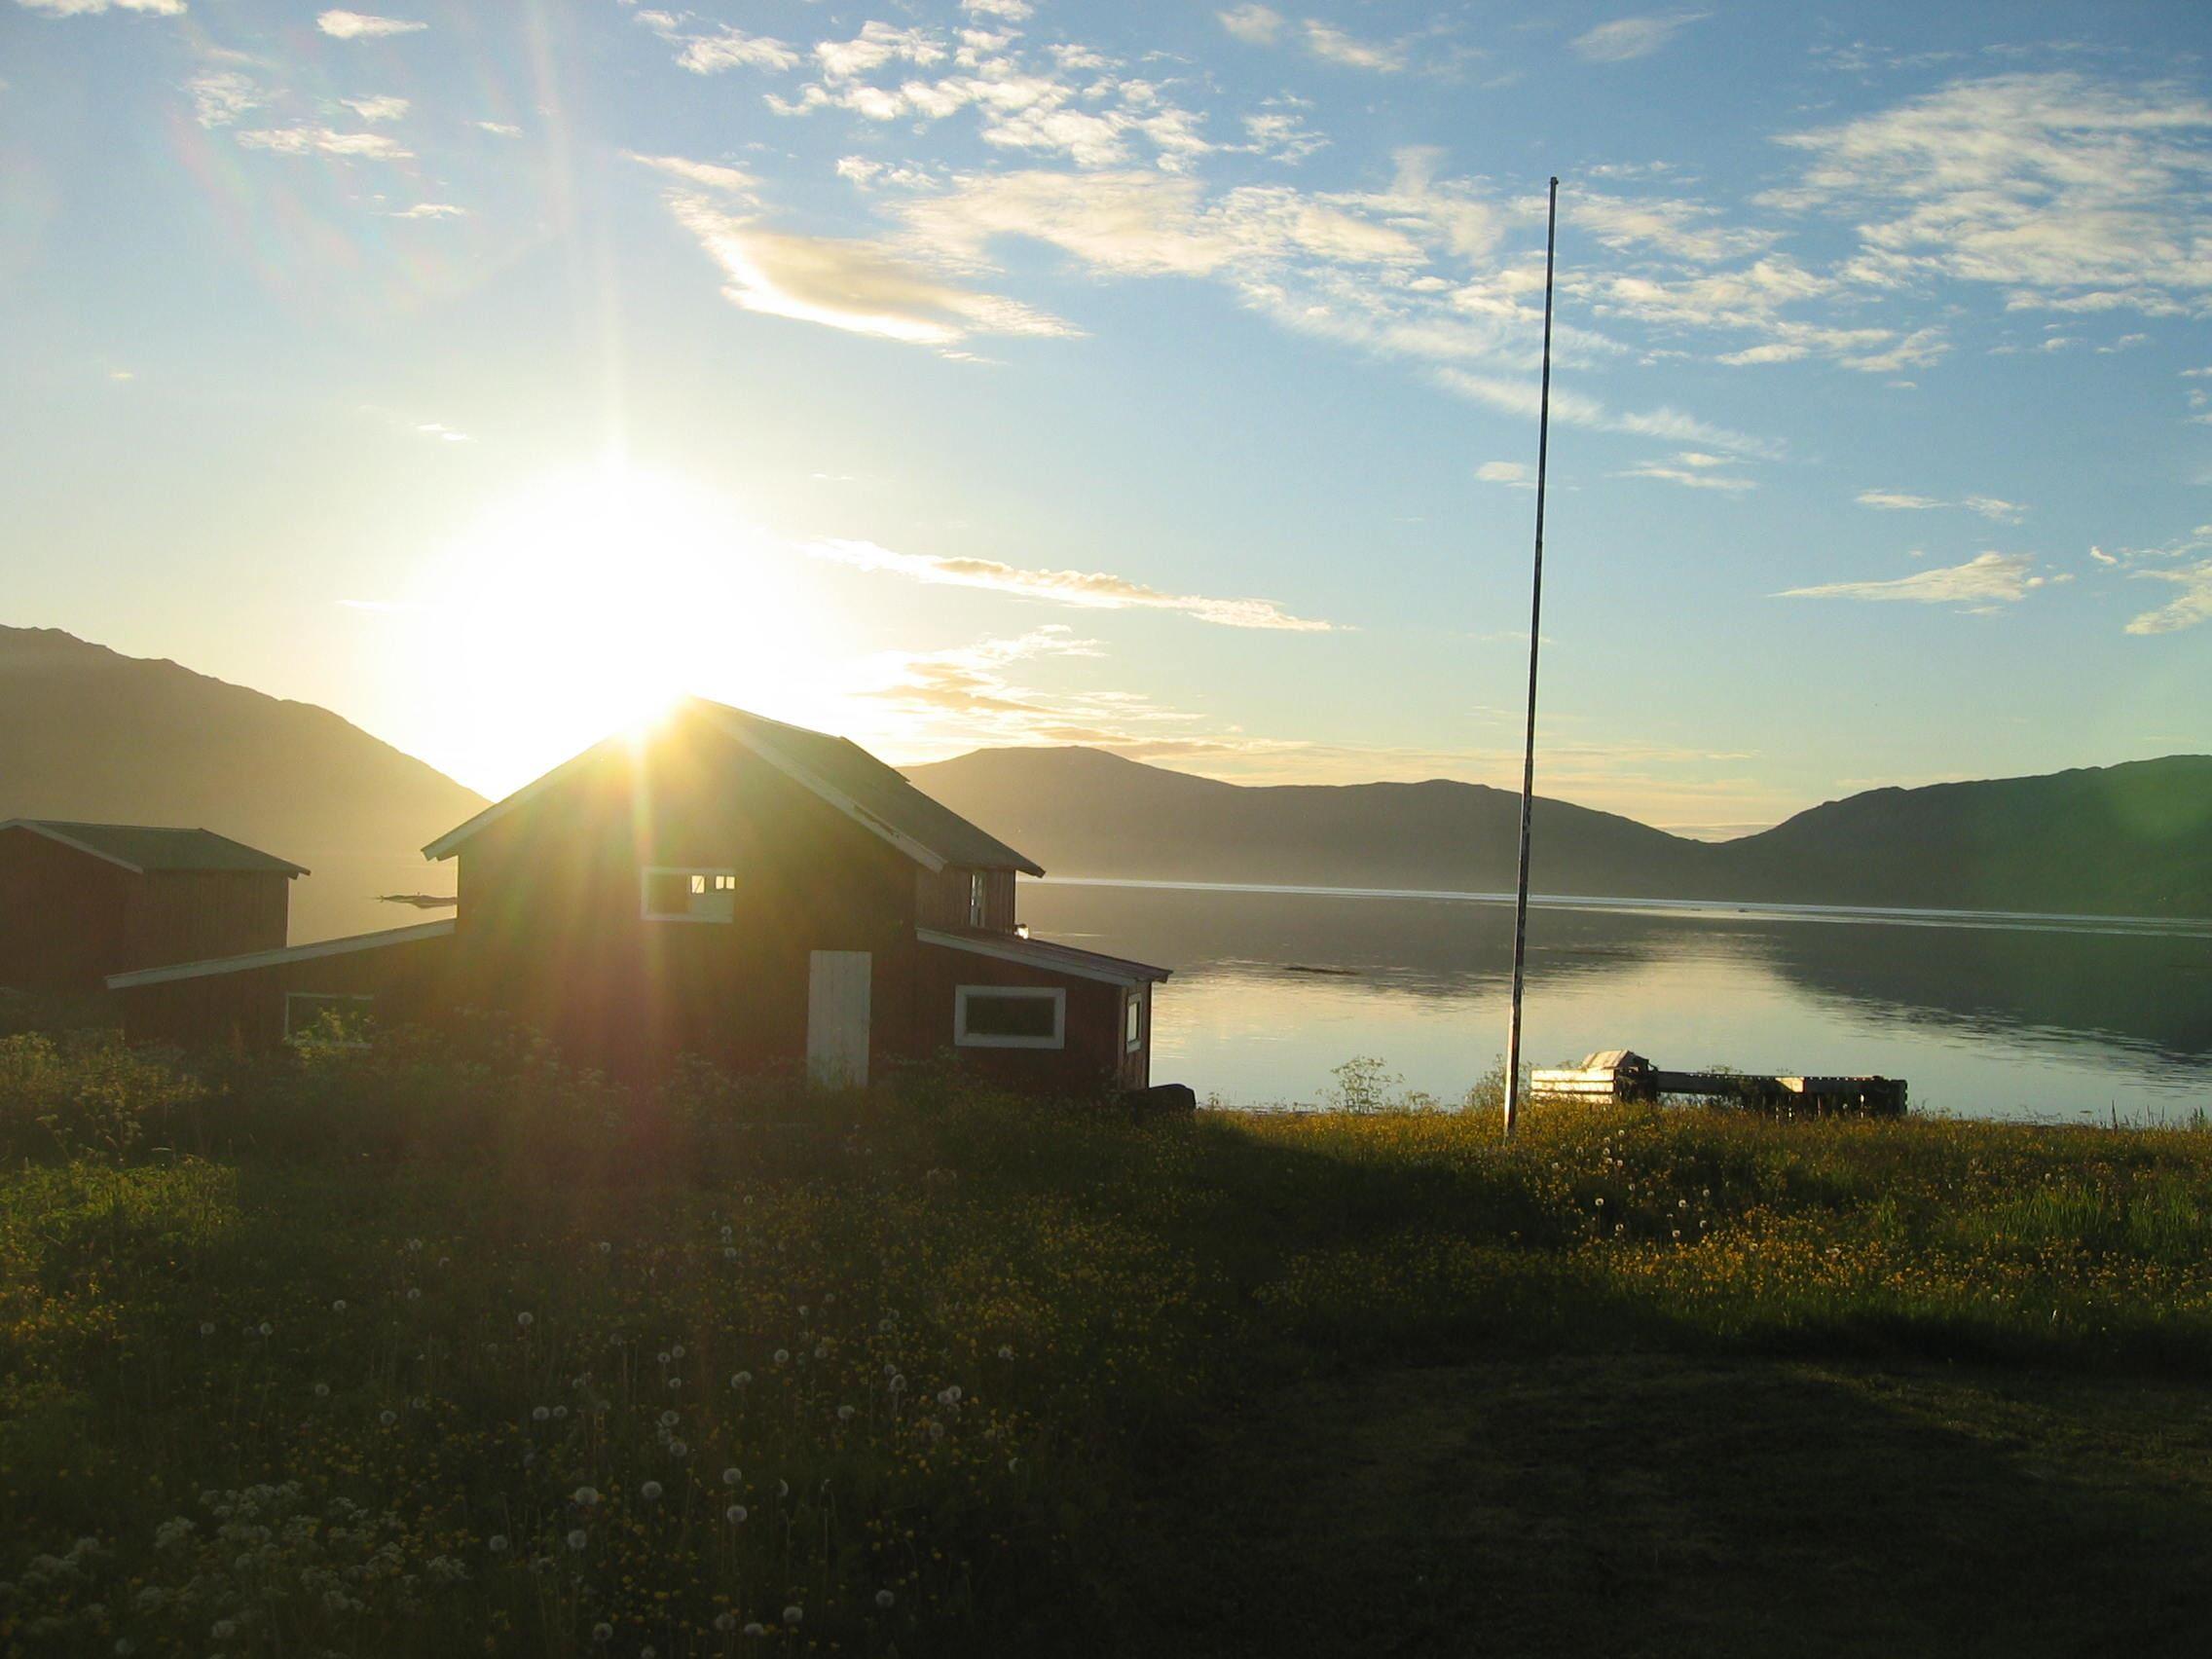 Midnight Sun Adventure by RiB - Tromsø Friluftsenter